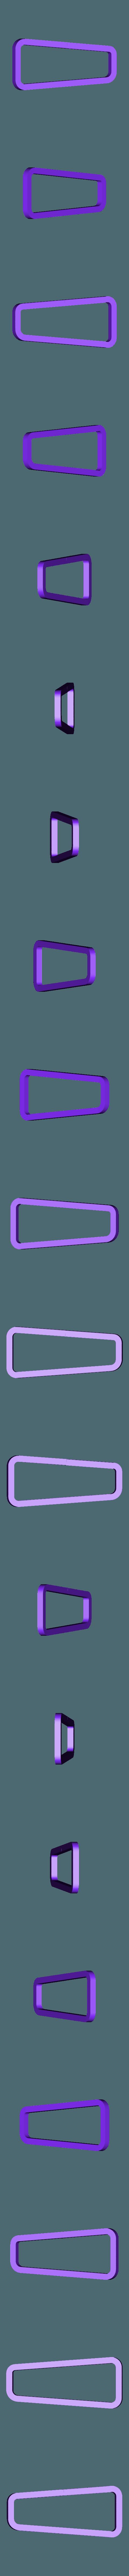 ruber.stl Download free STL file Rope tensioner (cam) fully printed • 3D printing object, dvilleneuve